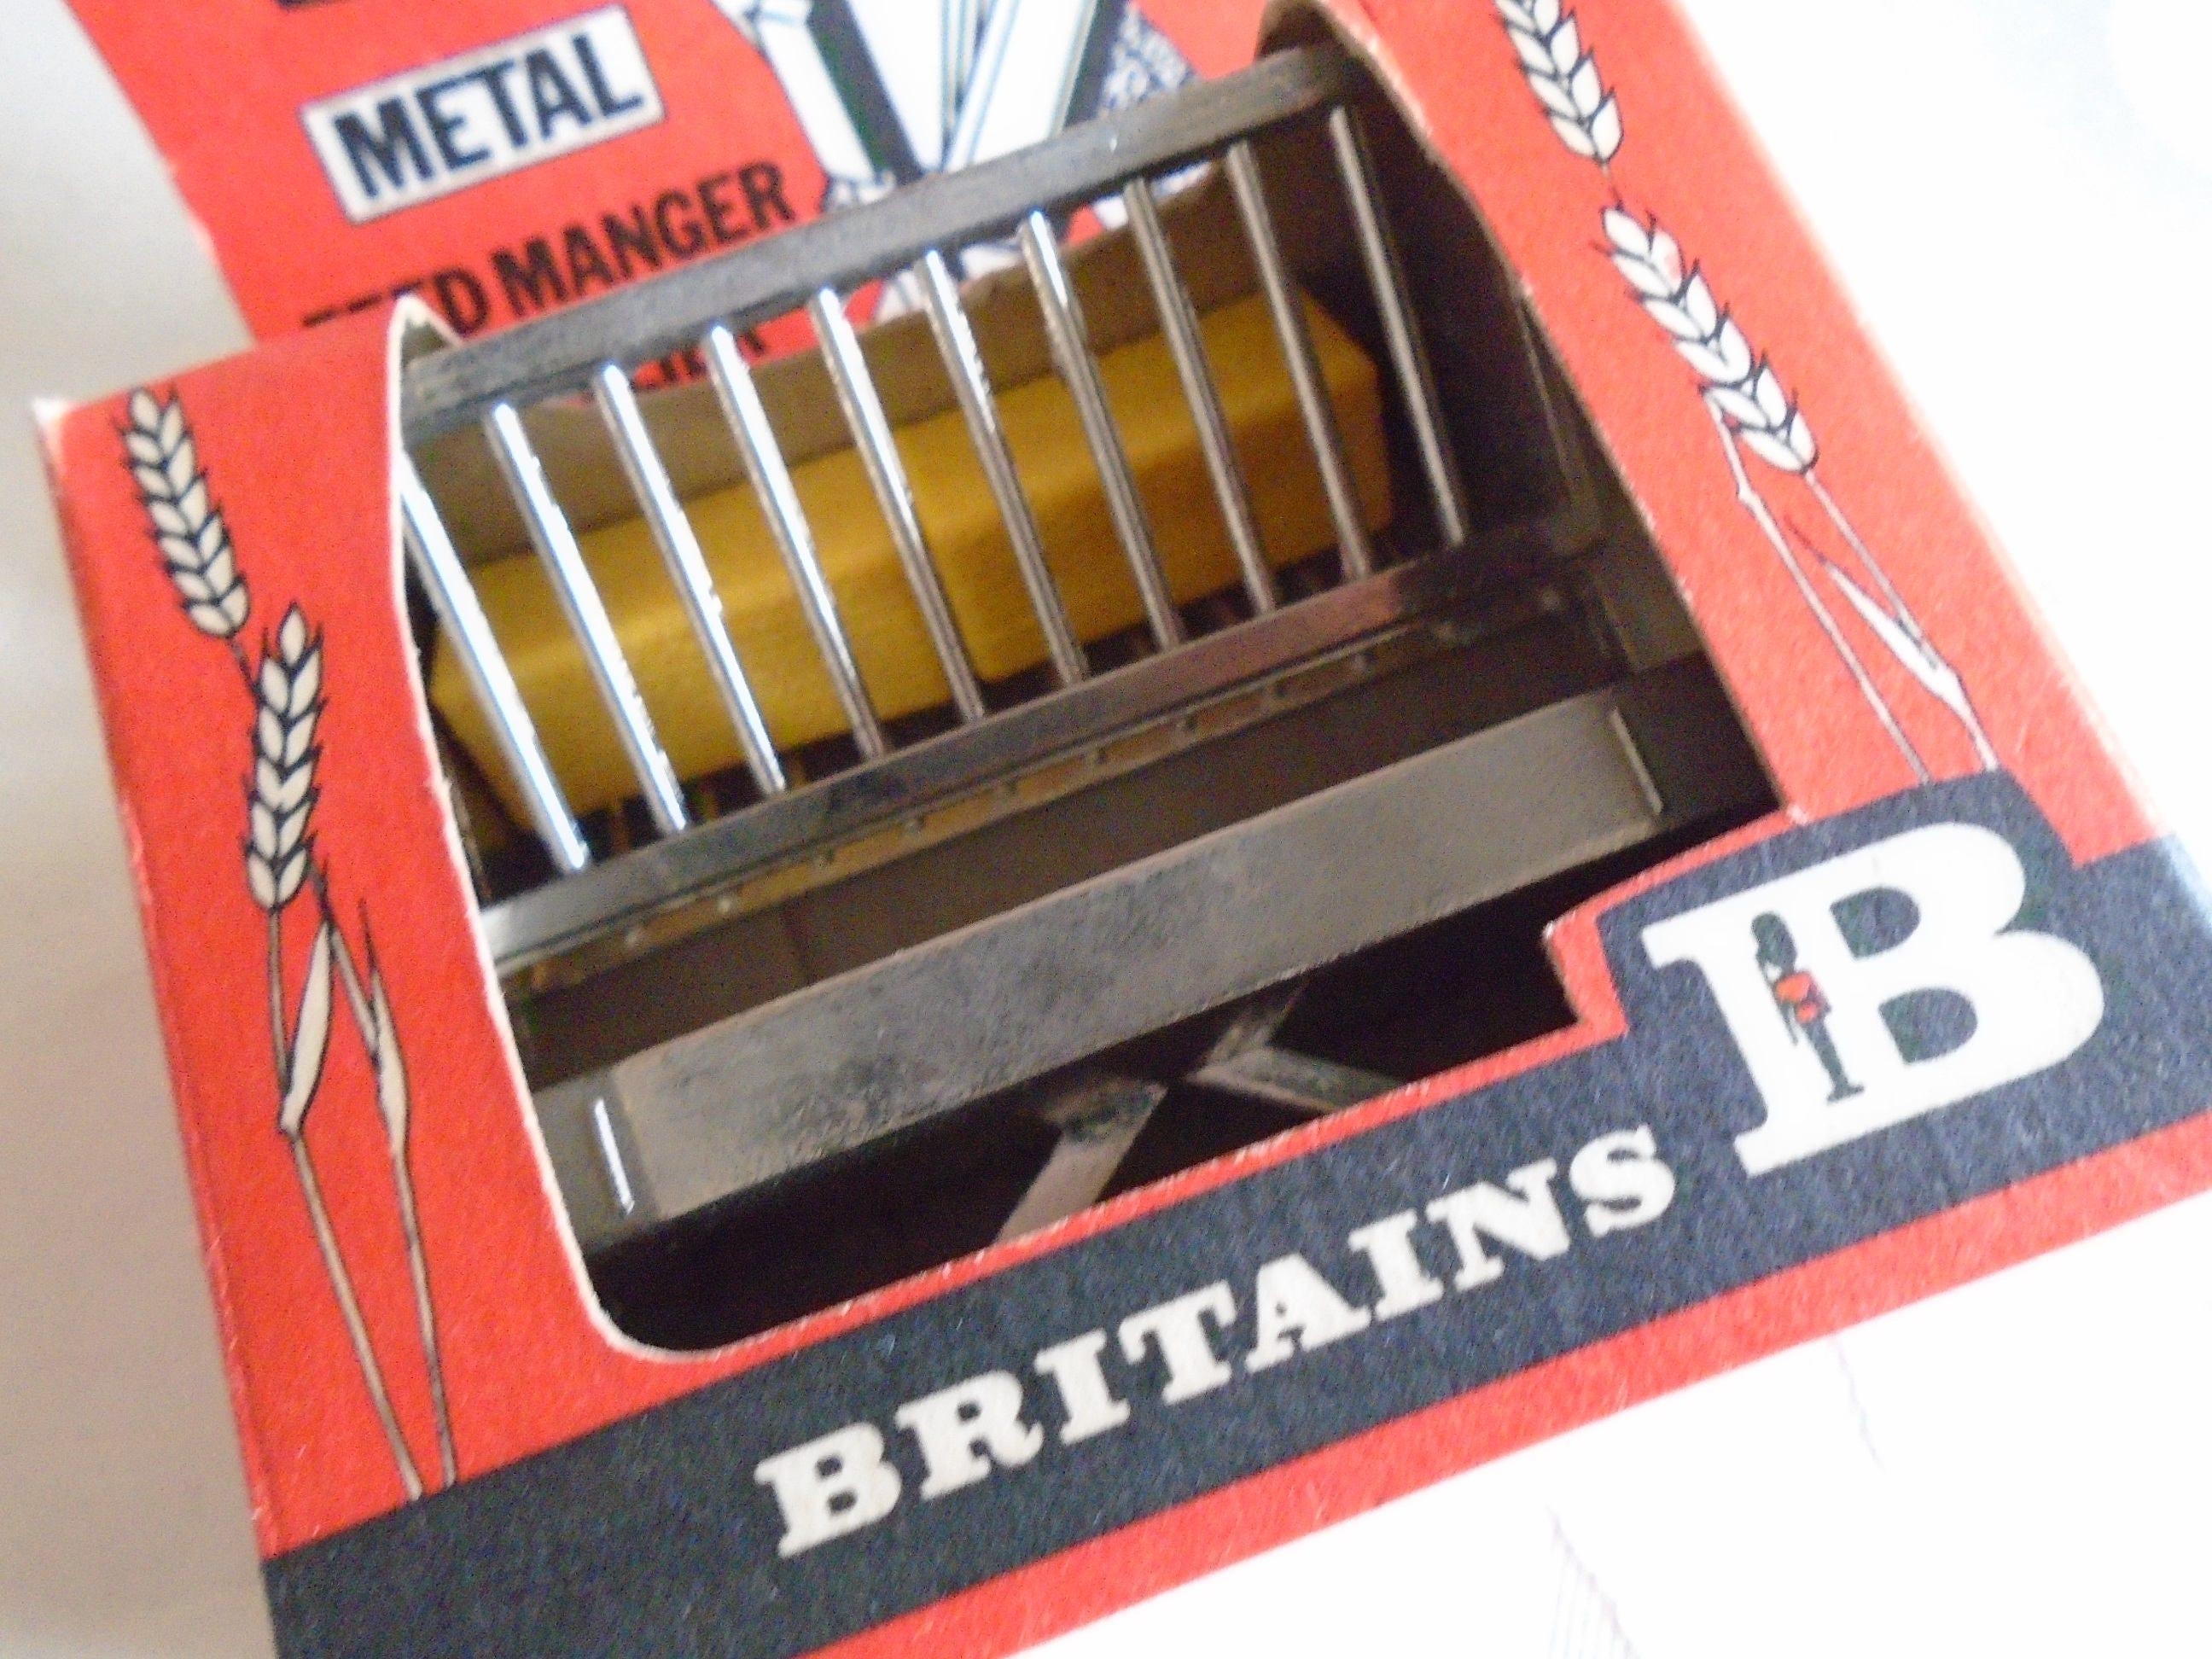 Britains 1979 feed manger original box